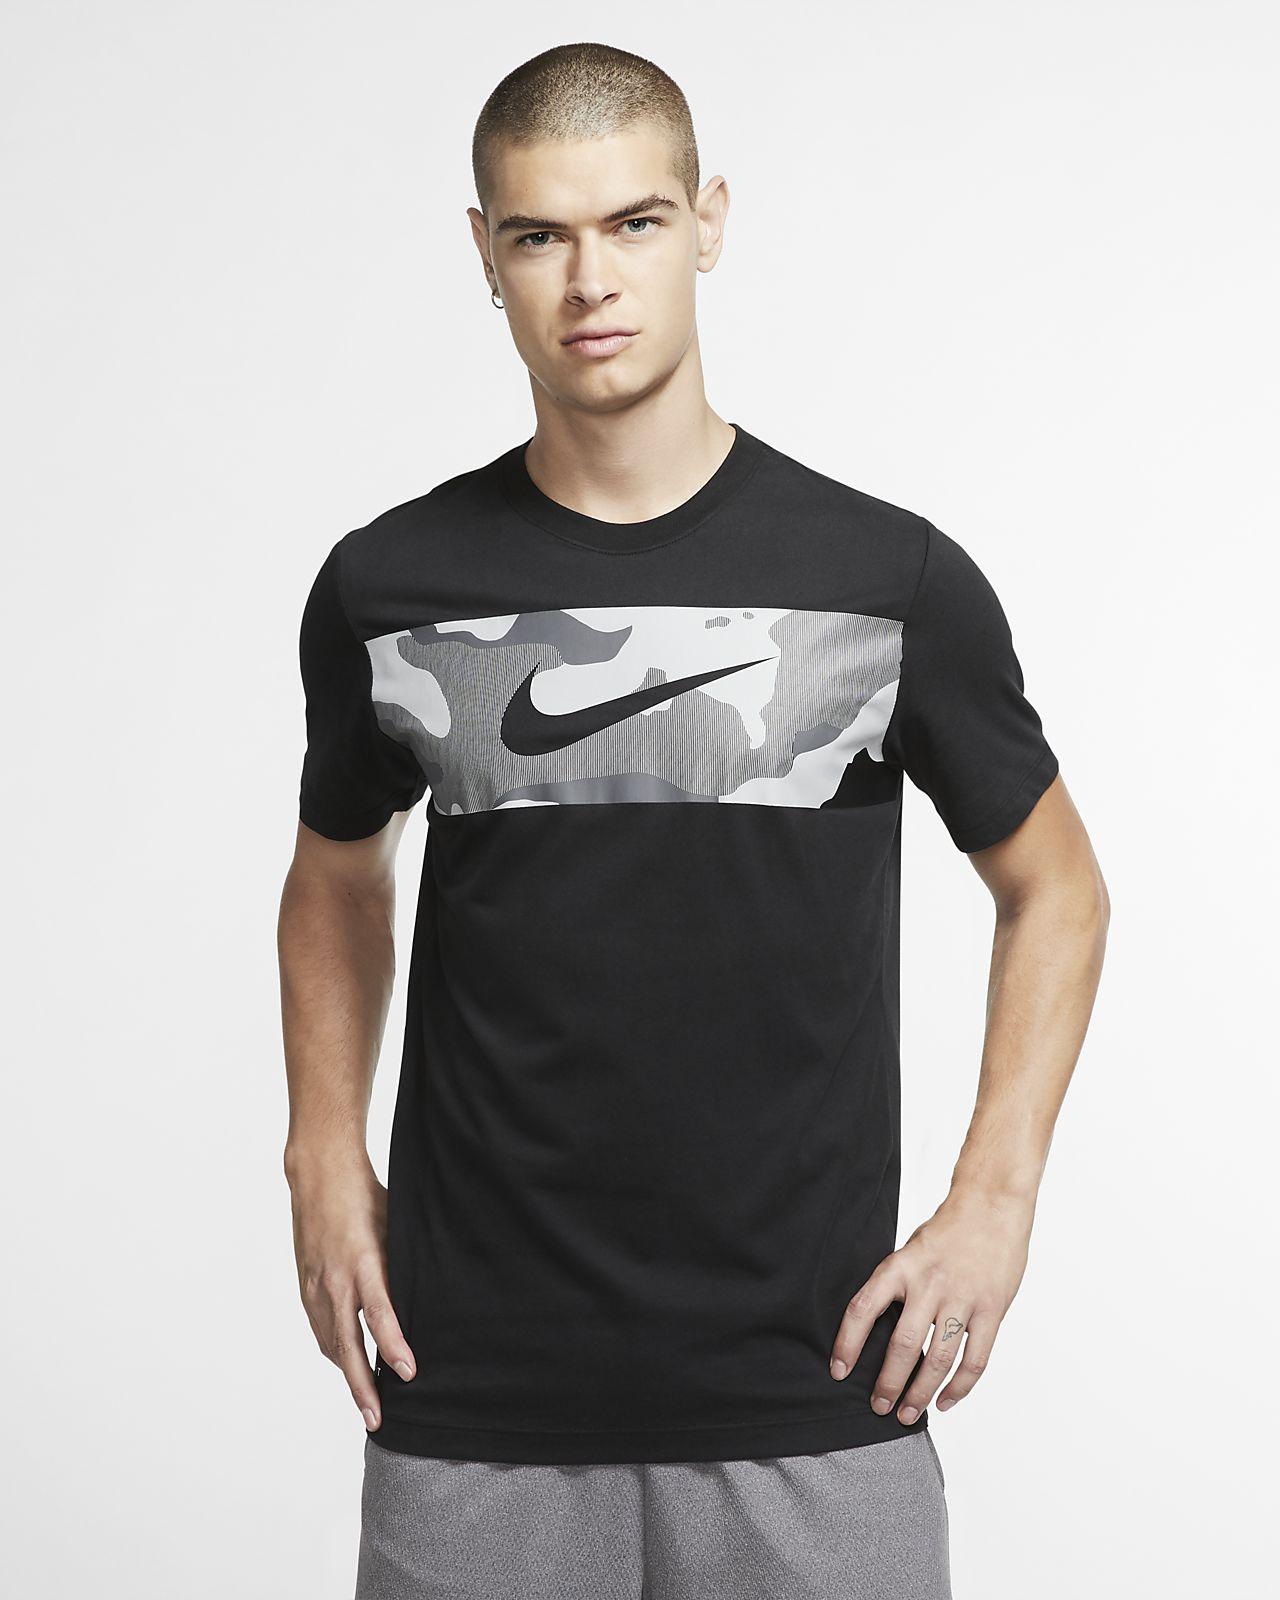 Nike Dri-FIT Trainings-T-Shirt für Herren